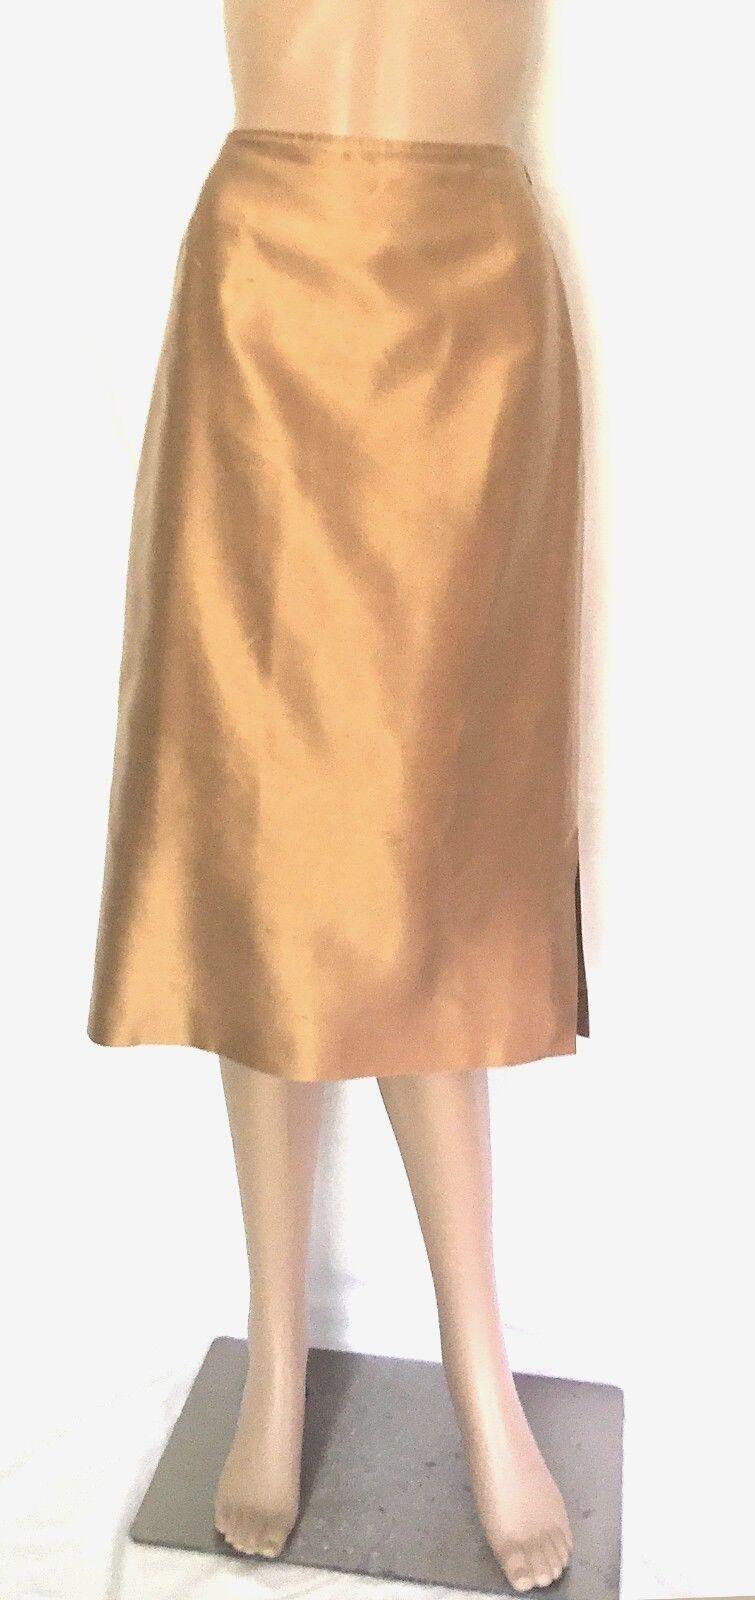 Max Mara gold Pura Seta (Silk) A Line Skirt - Size 6 - EUC